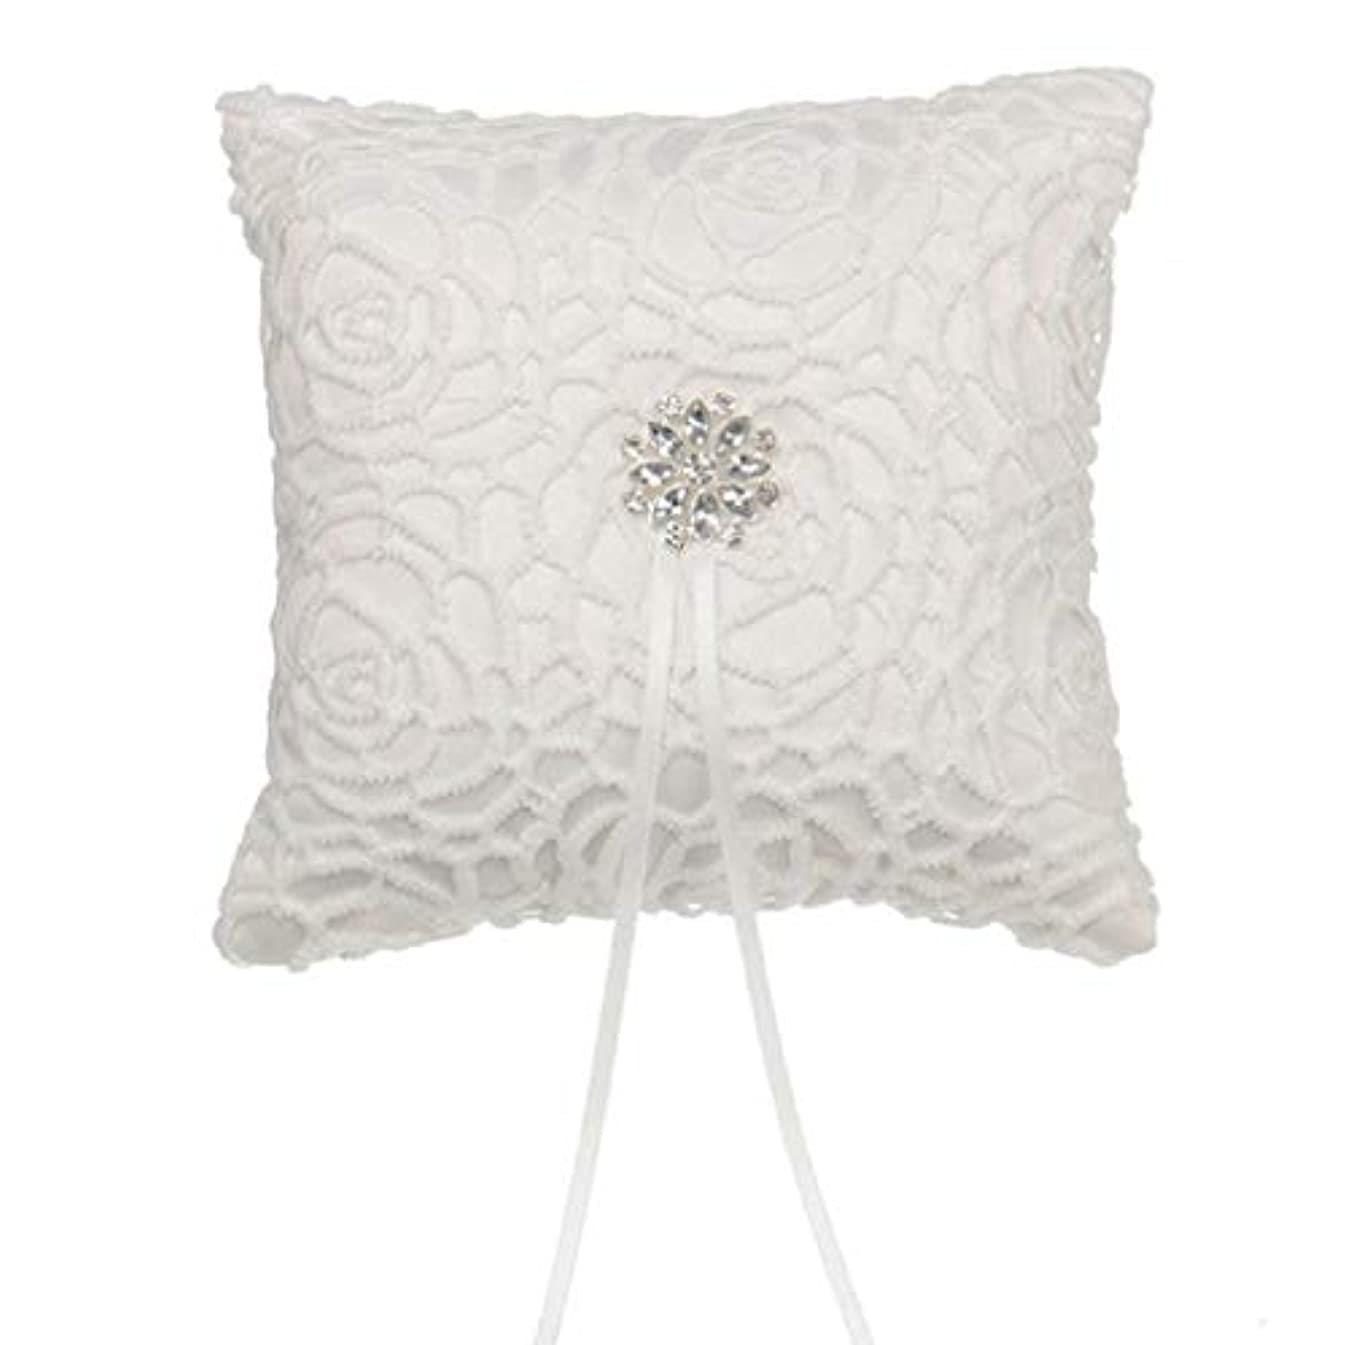 Beautiful White Flower Shape With Flash Diamond Romantic Wedding Ring Pillow Cushion